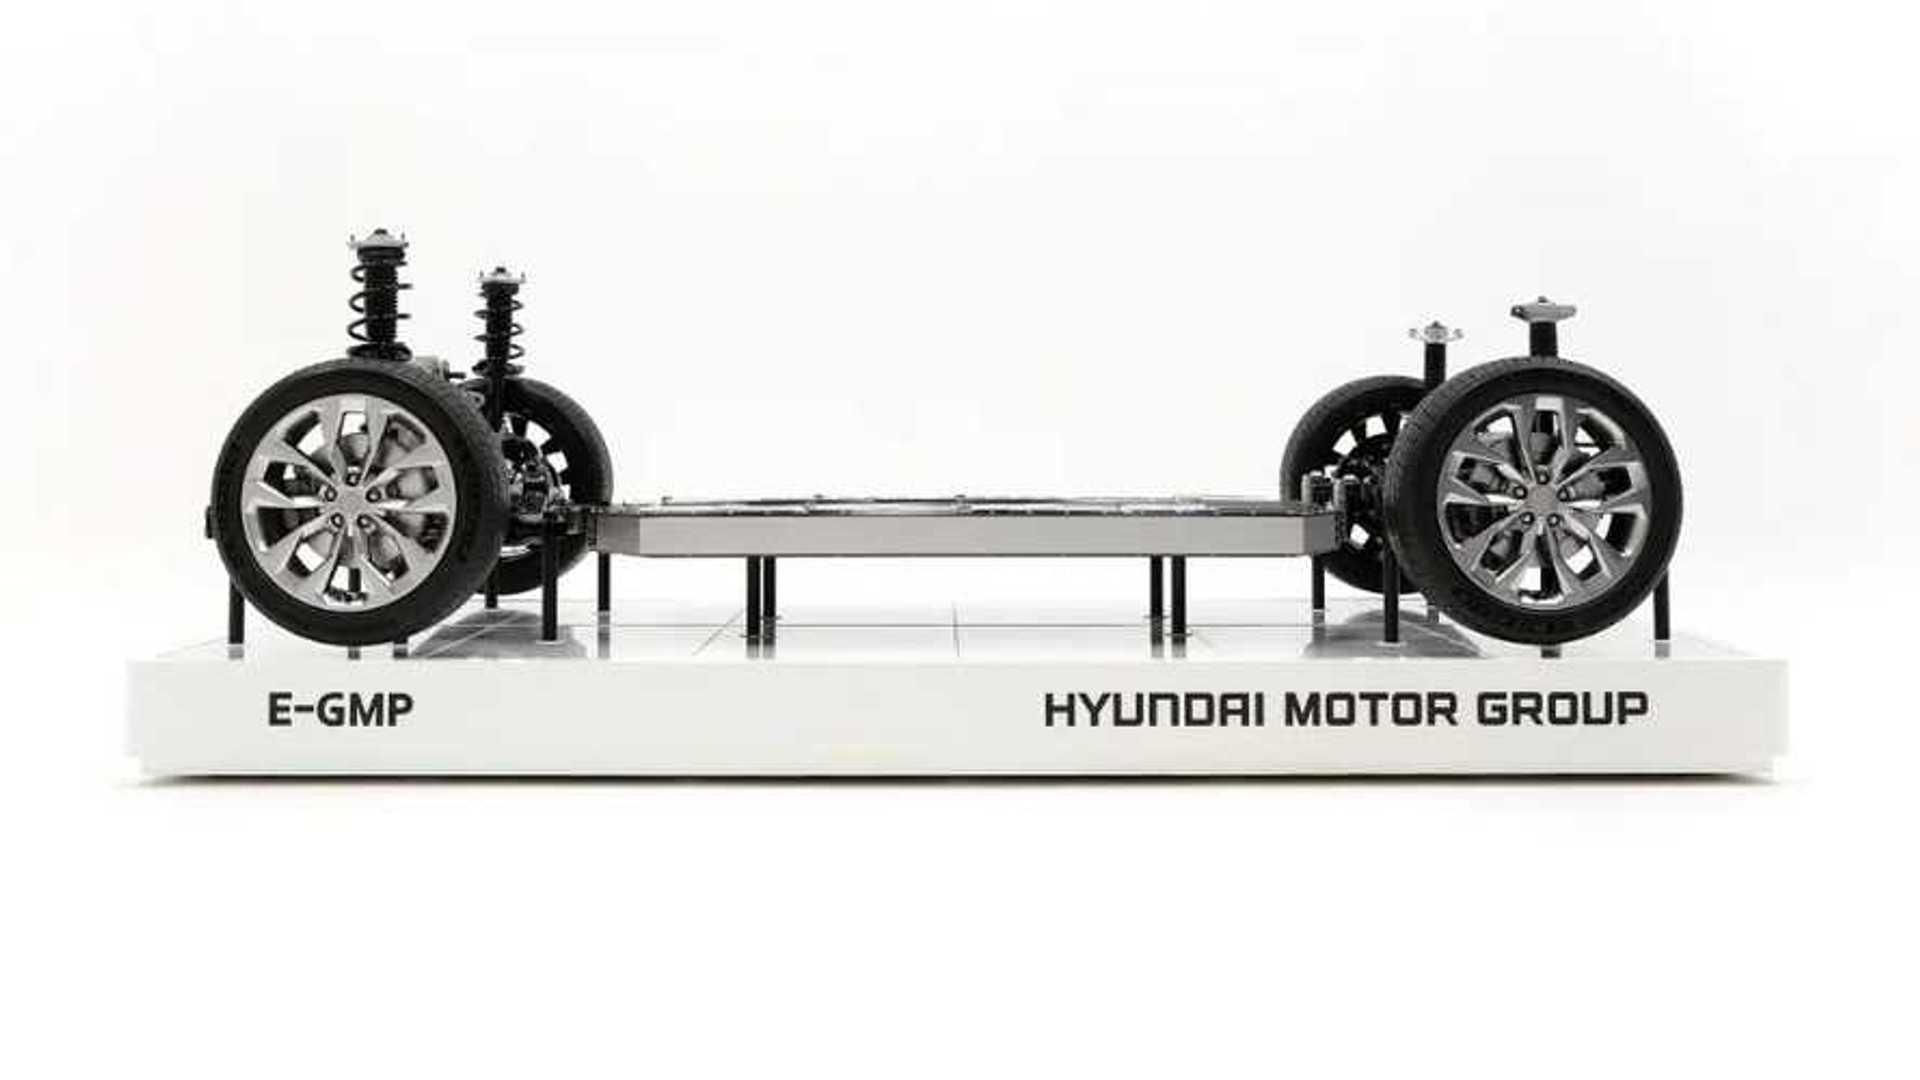 Hyundai Introduces Electric-Global Modular Platform (E-GMP)